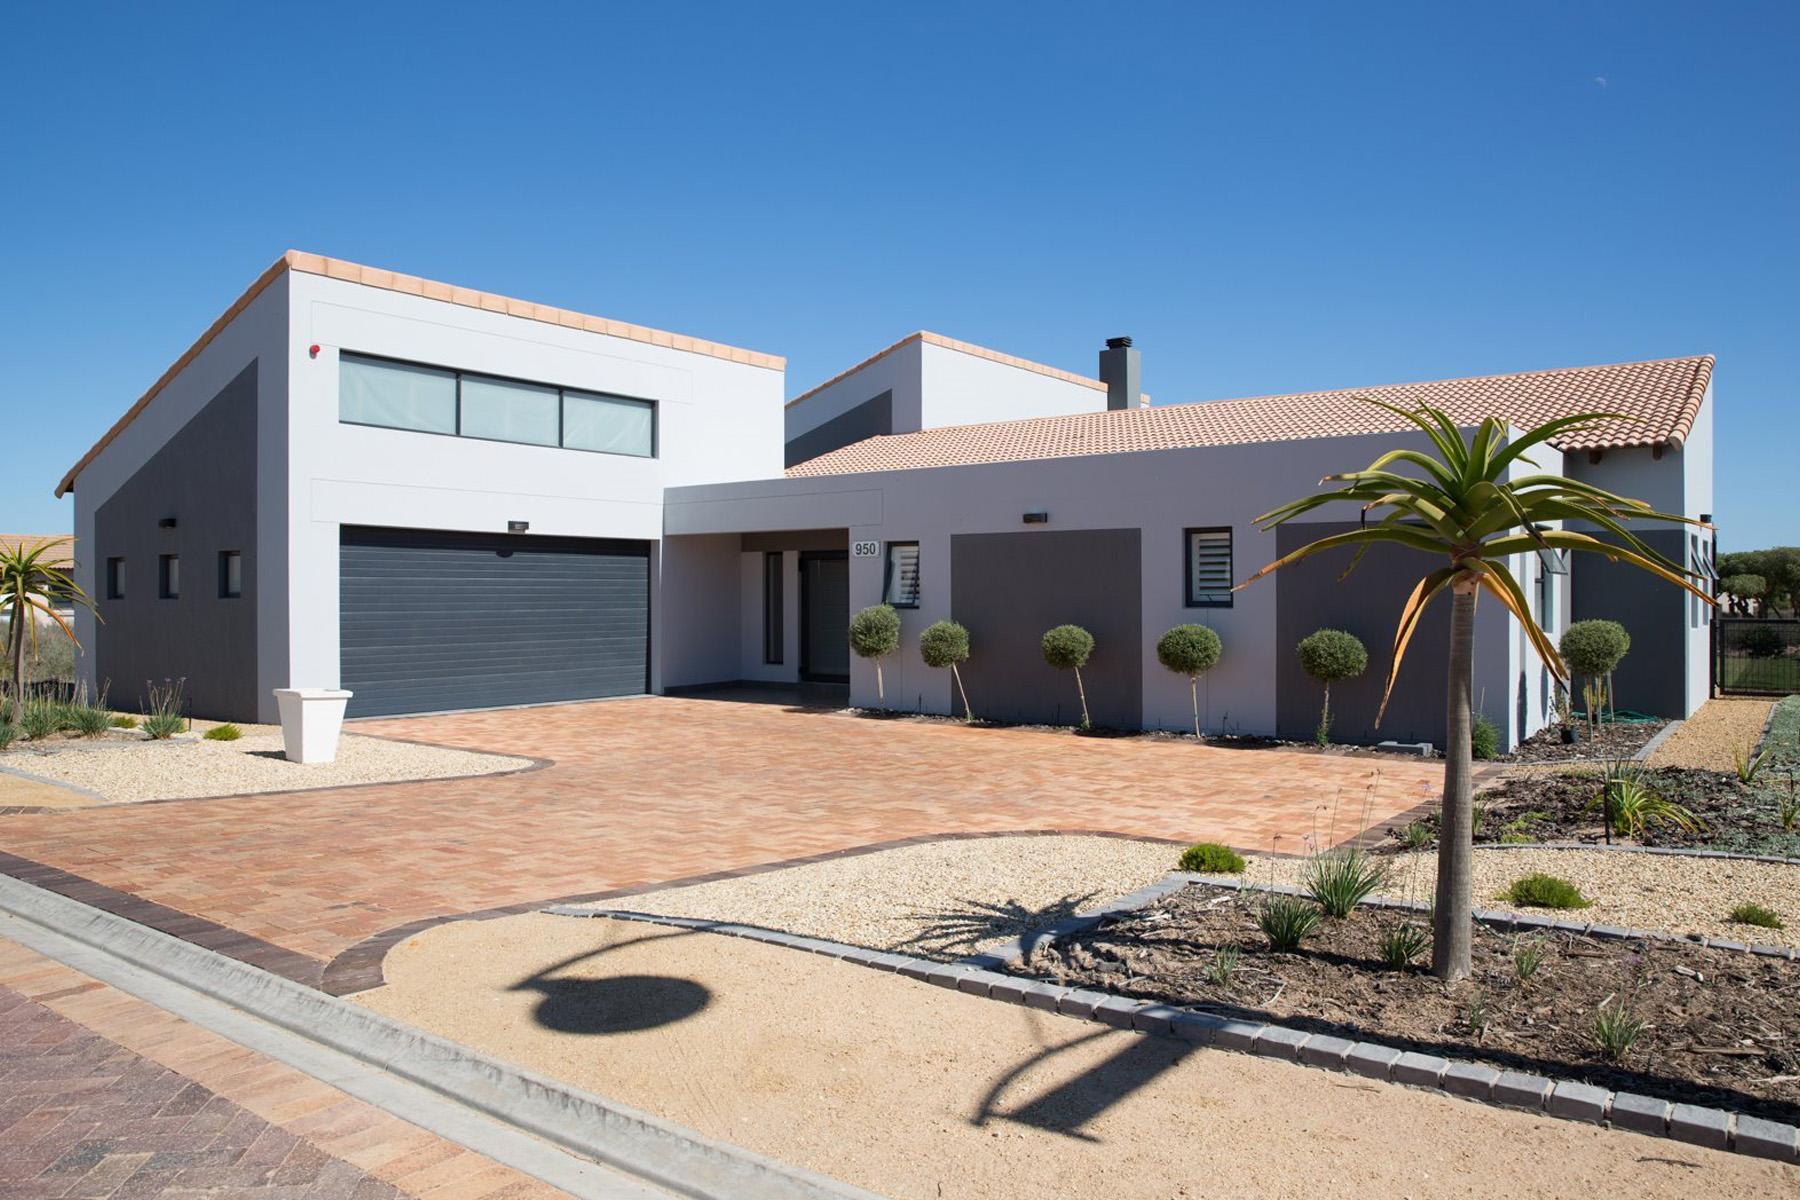 Объект для продажи Cape Town